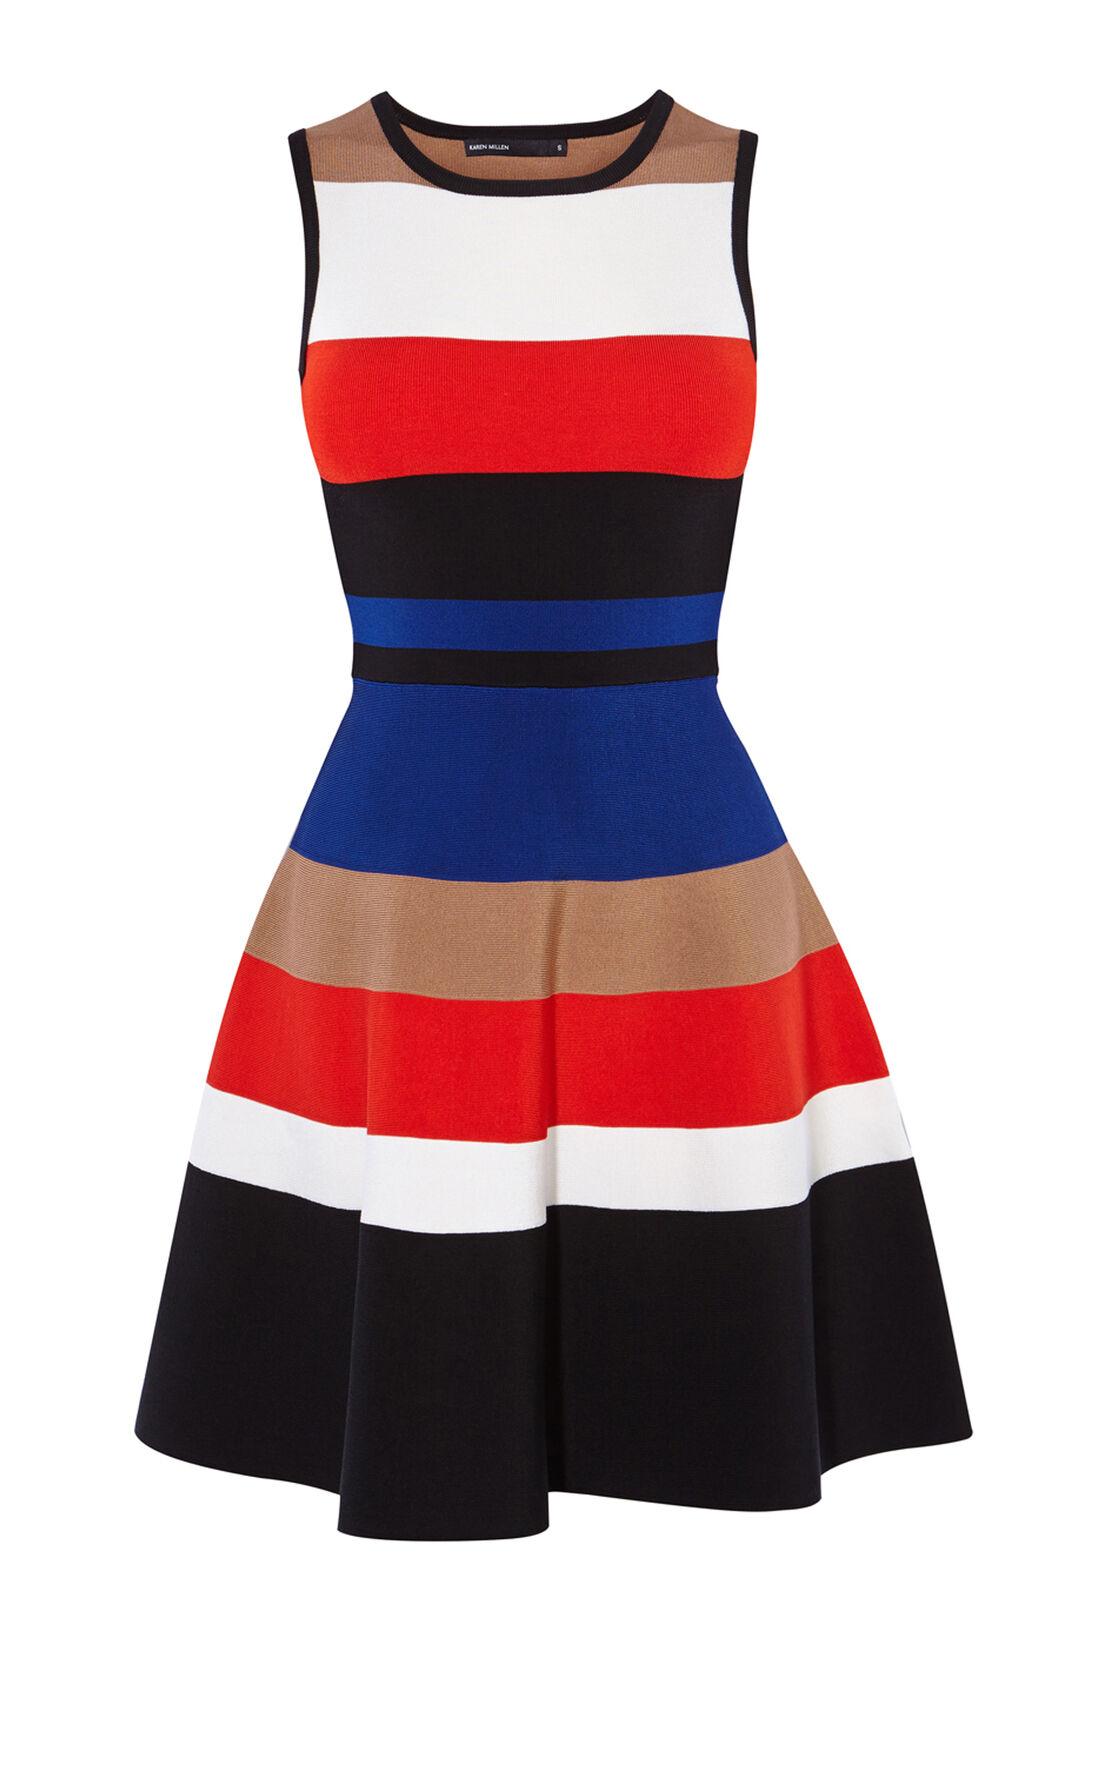 Karen Millen, MULTI-COLOUR STRIPED DRESS Multi 0